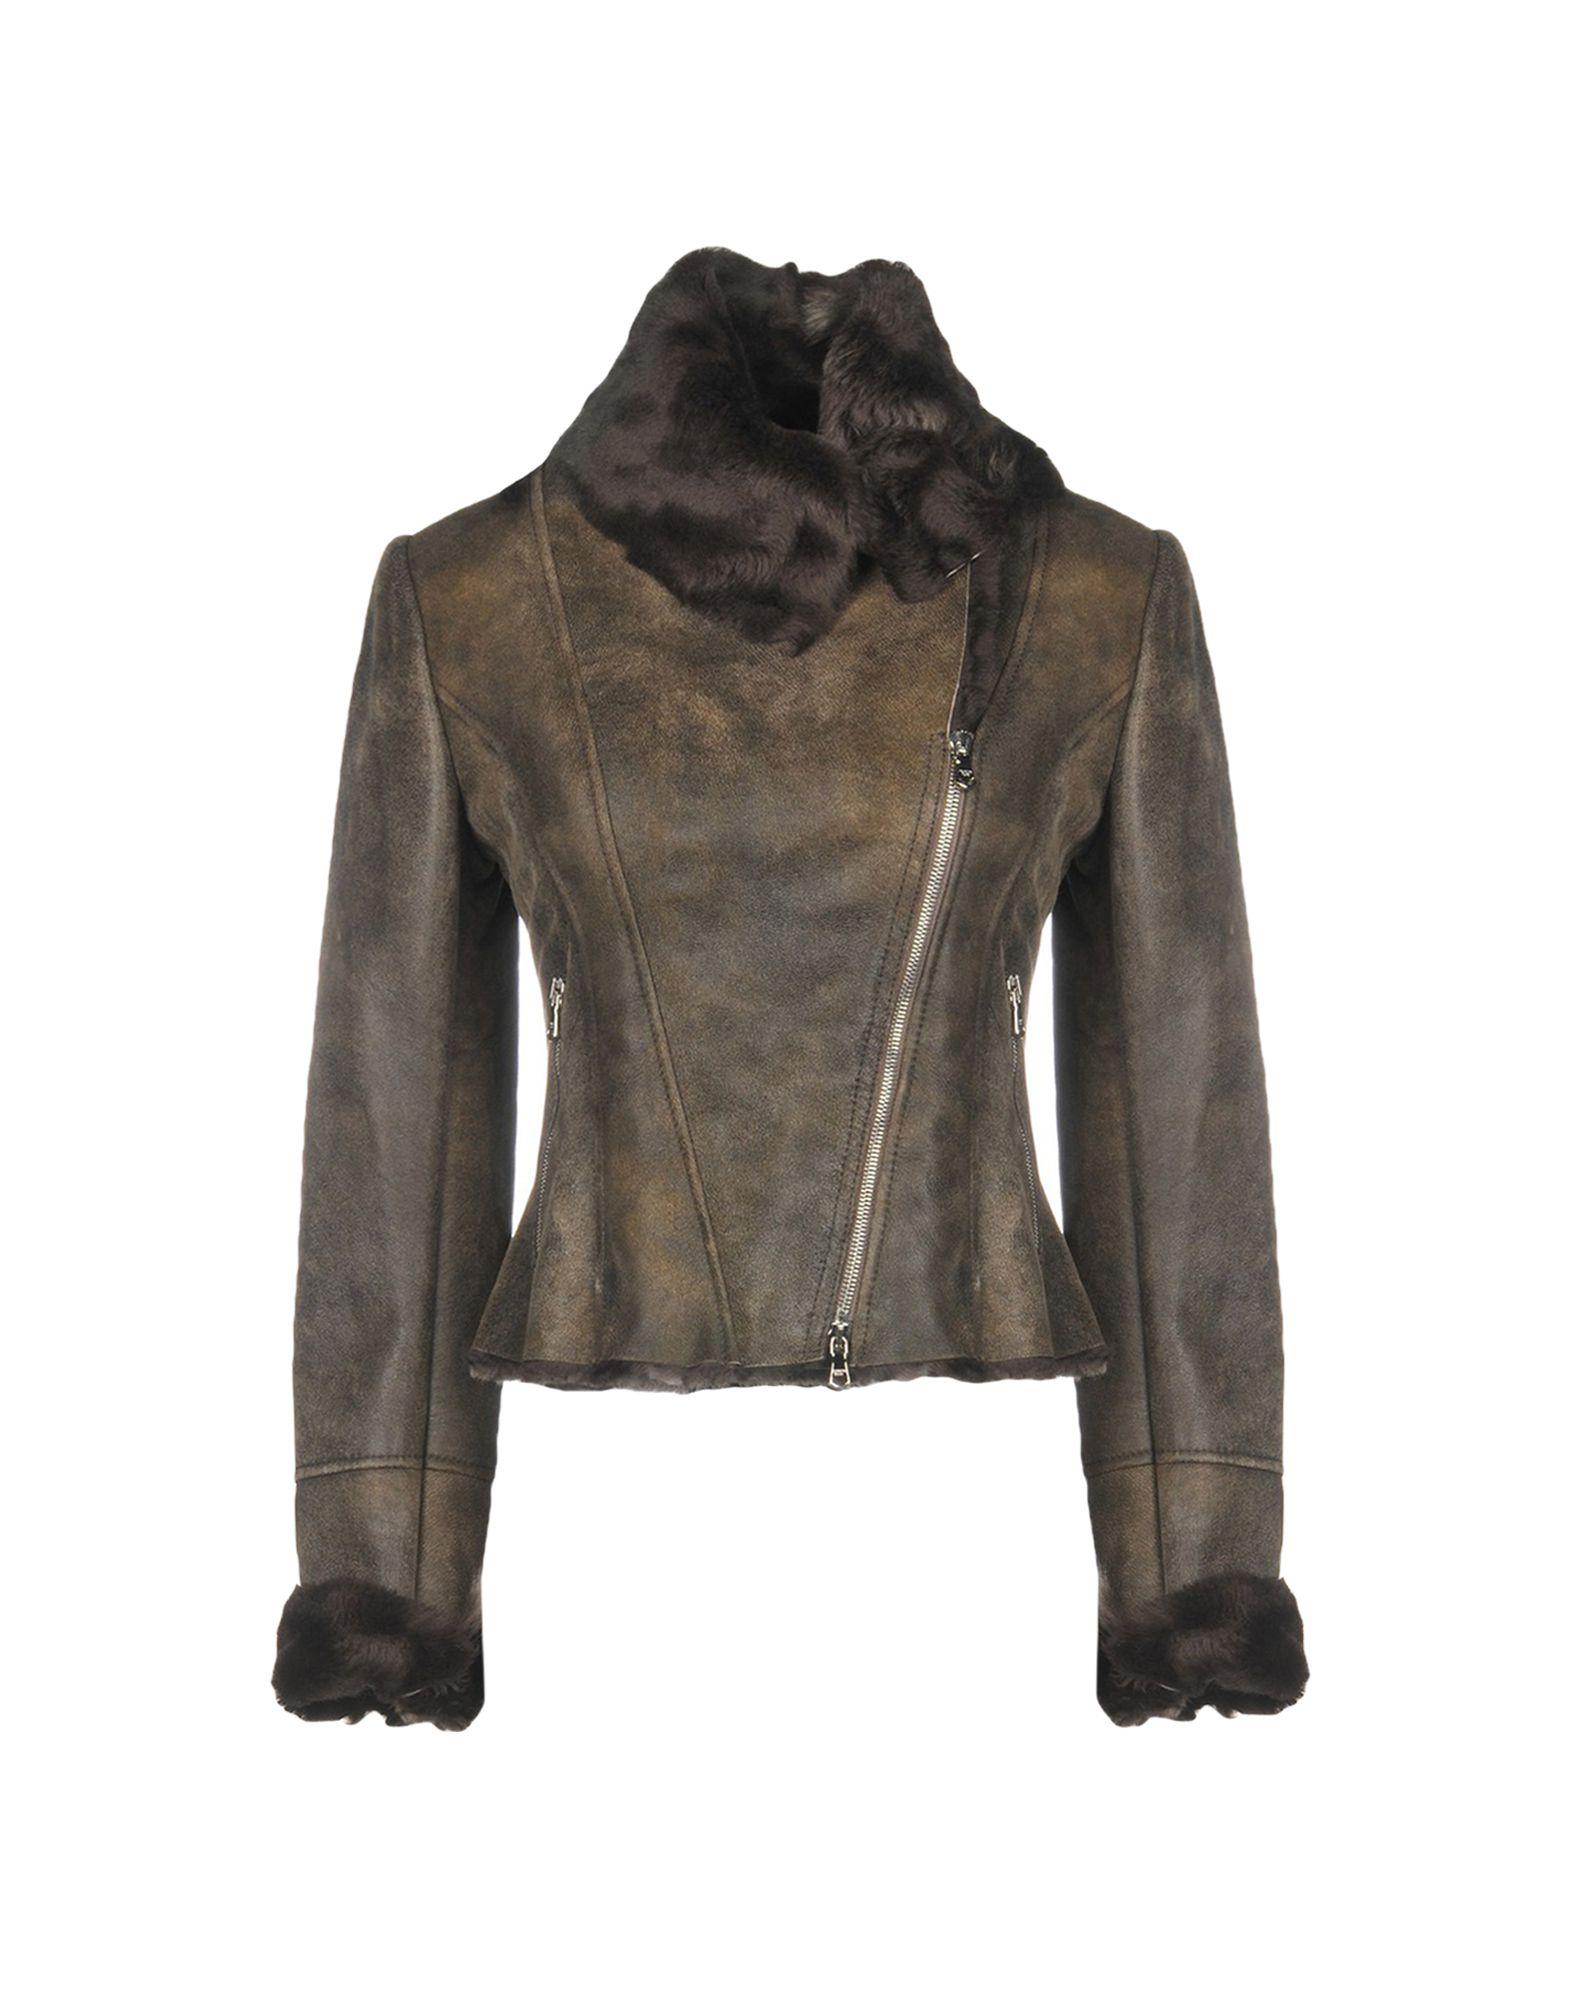 Best women s fashion shop - Online shopping website for women ... 2180f6cea140